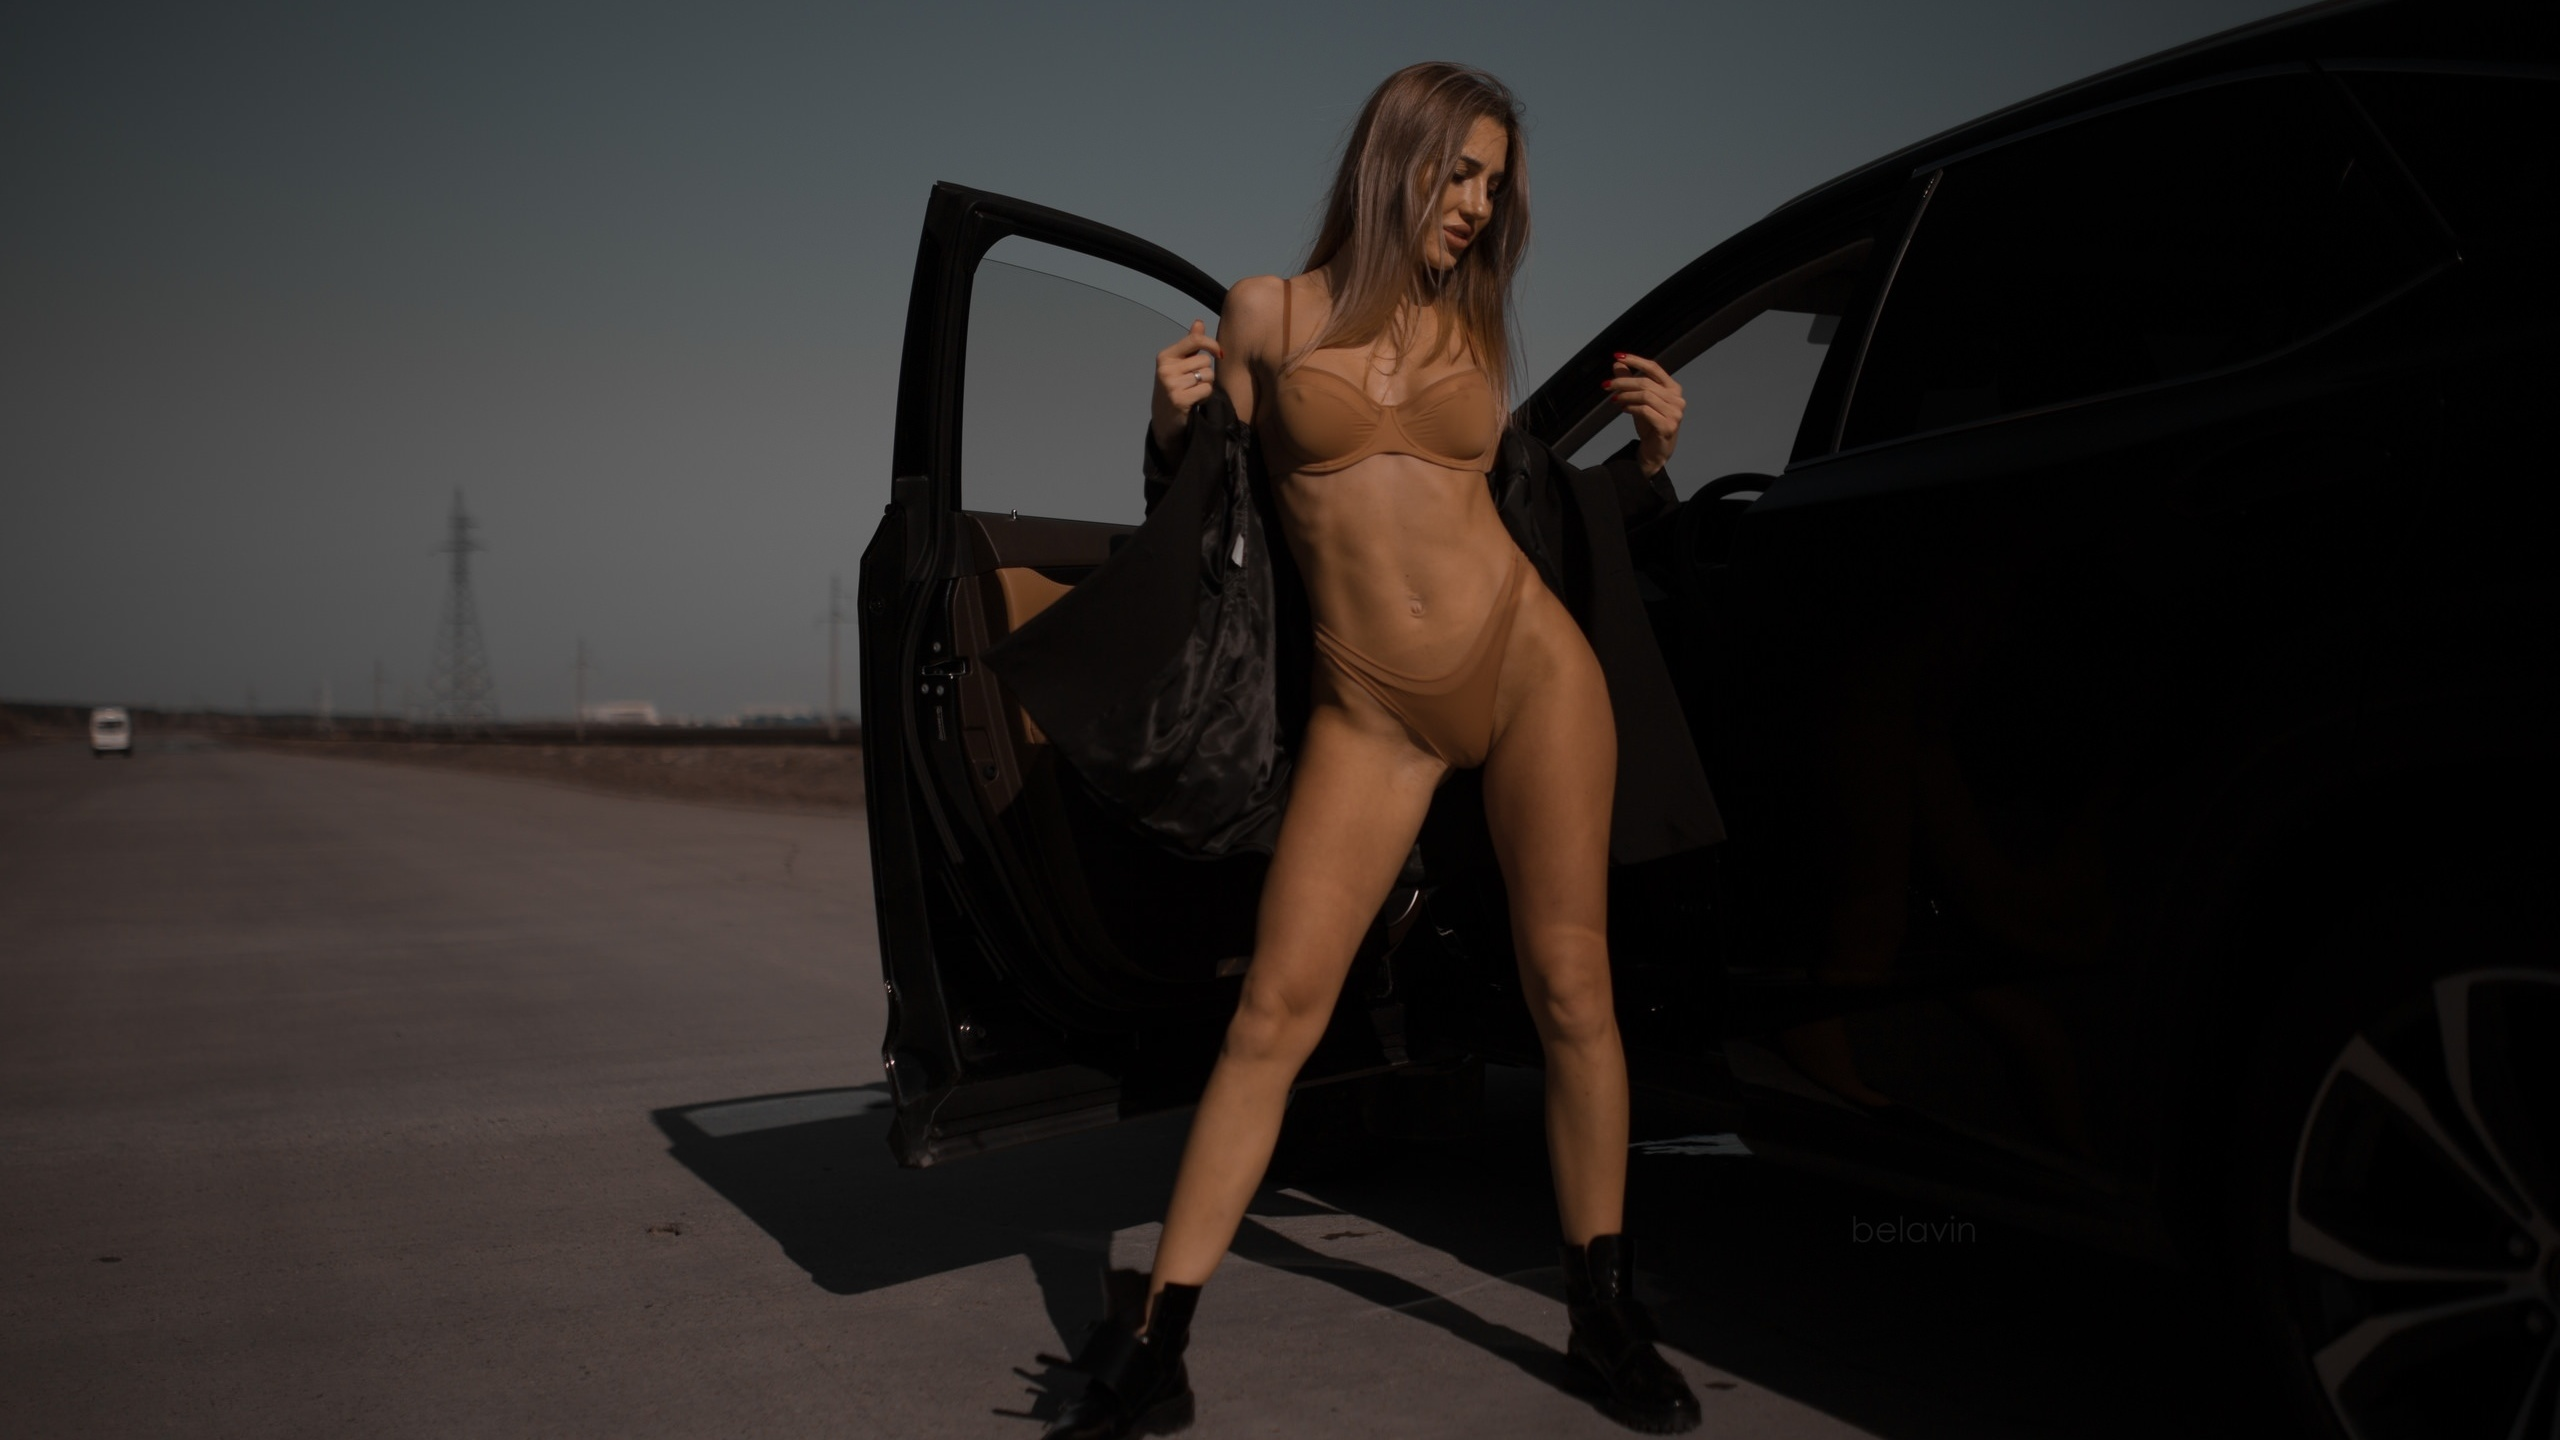 women, alexander belavin, brunette, shoes, lingerie, belly, women outdoors, car, women with cars, ribs, red nails, coats